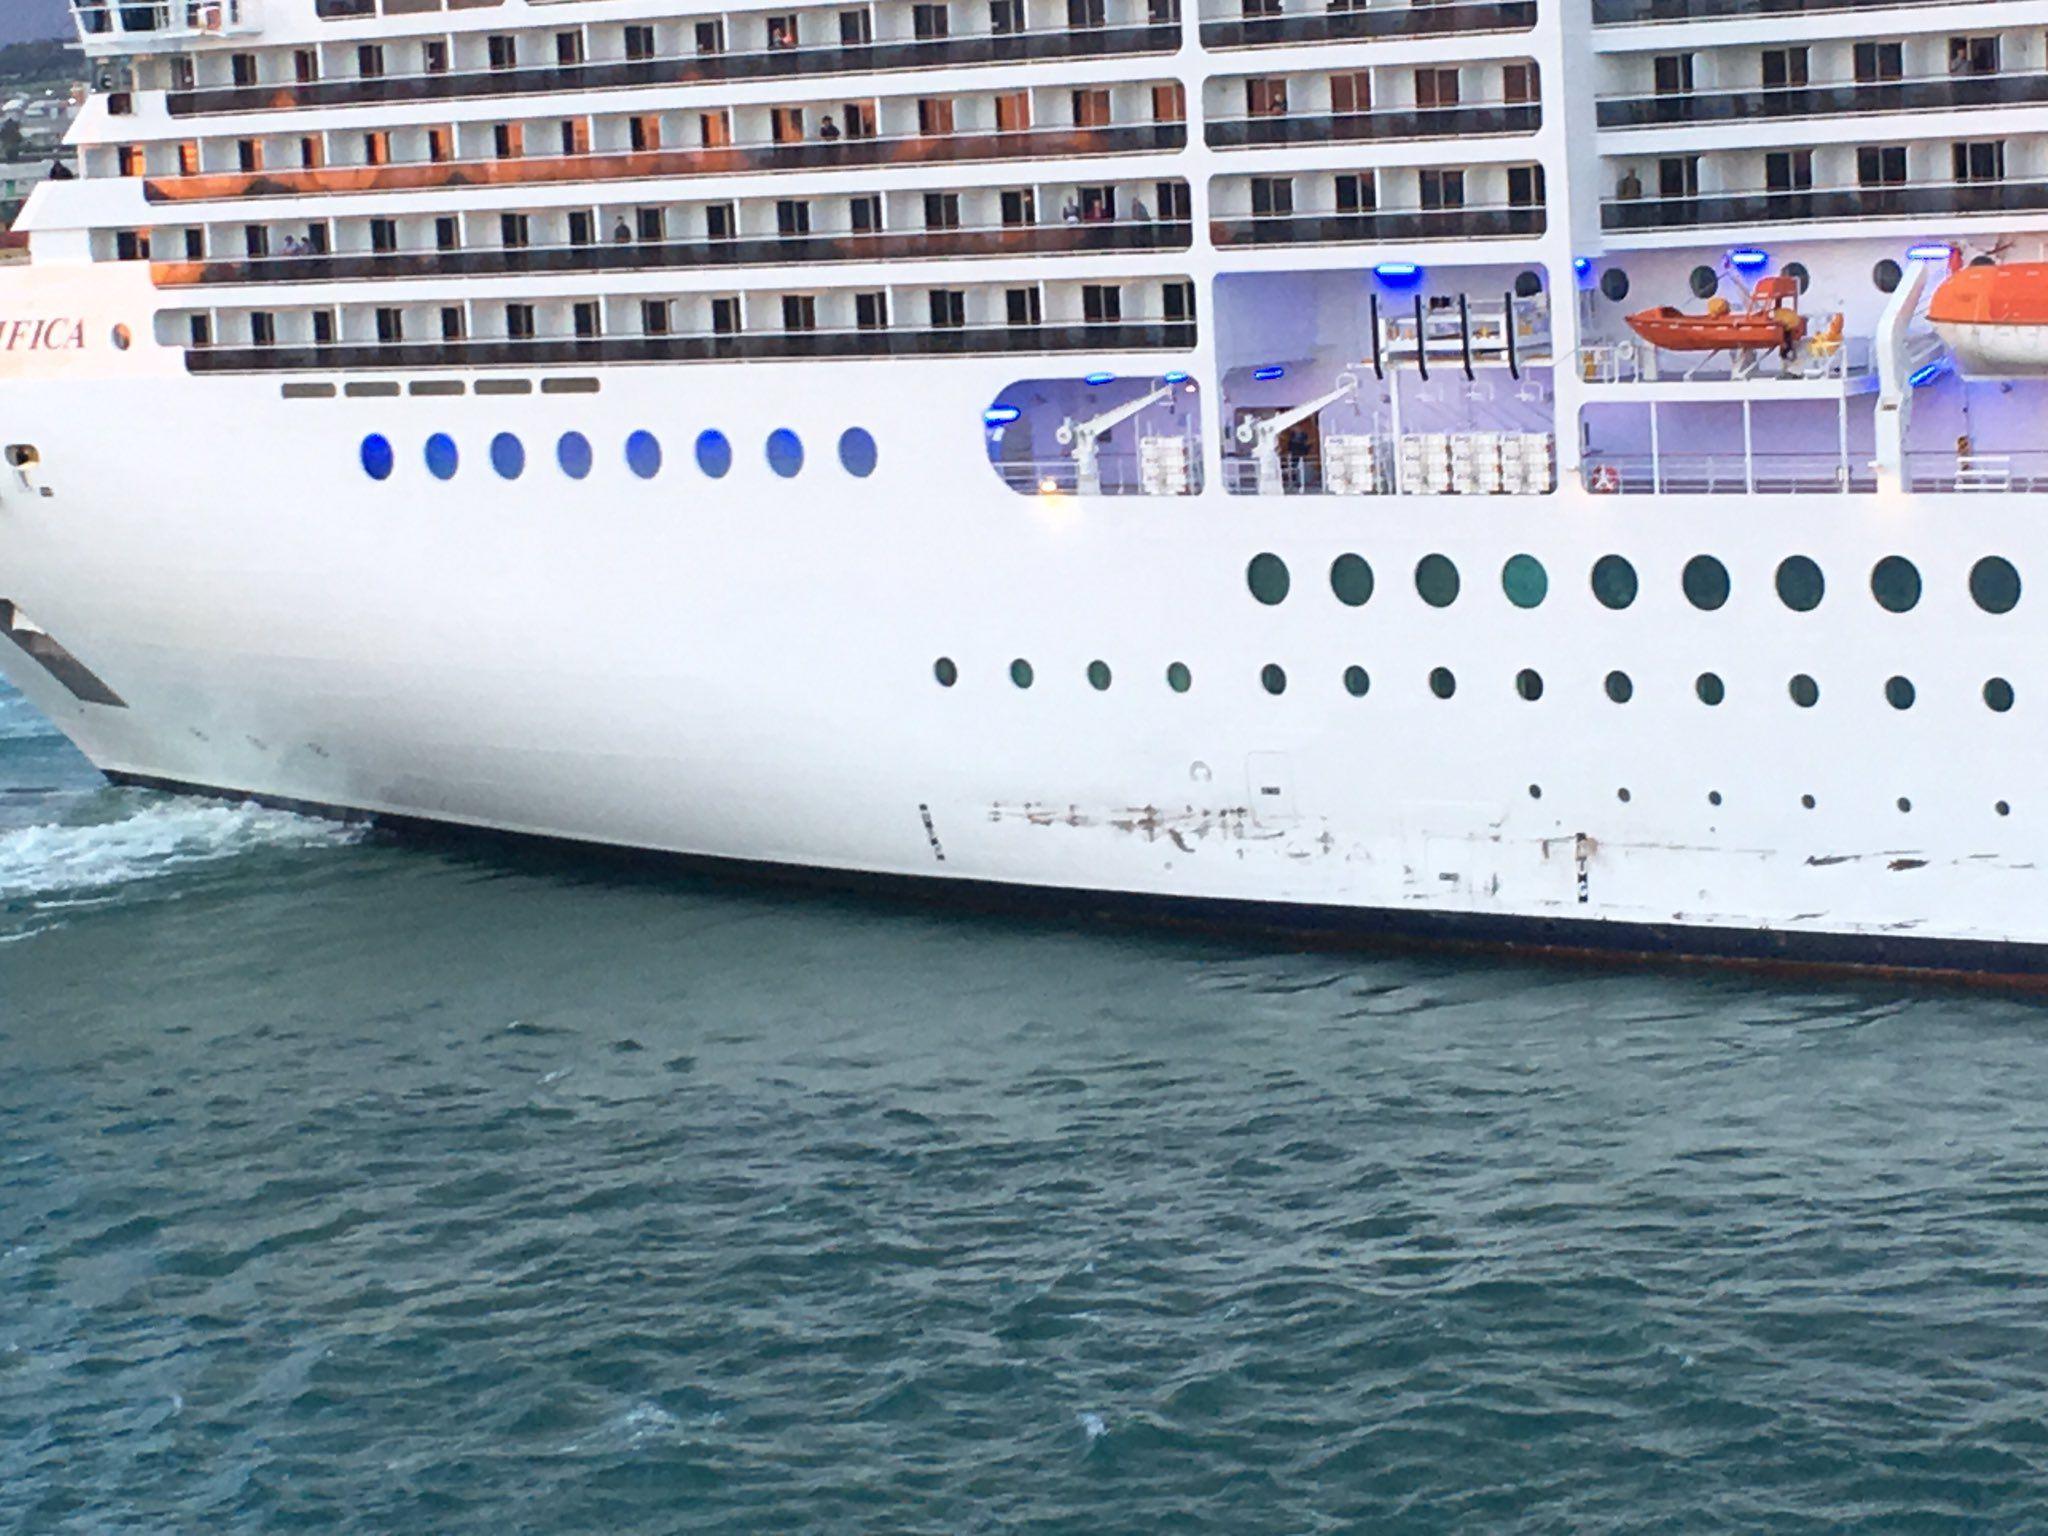 Msc Cruise Ship Damaged After Colliding With Quayside Msc Cruises Cruise Ship Civitavecchia